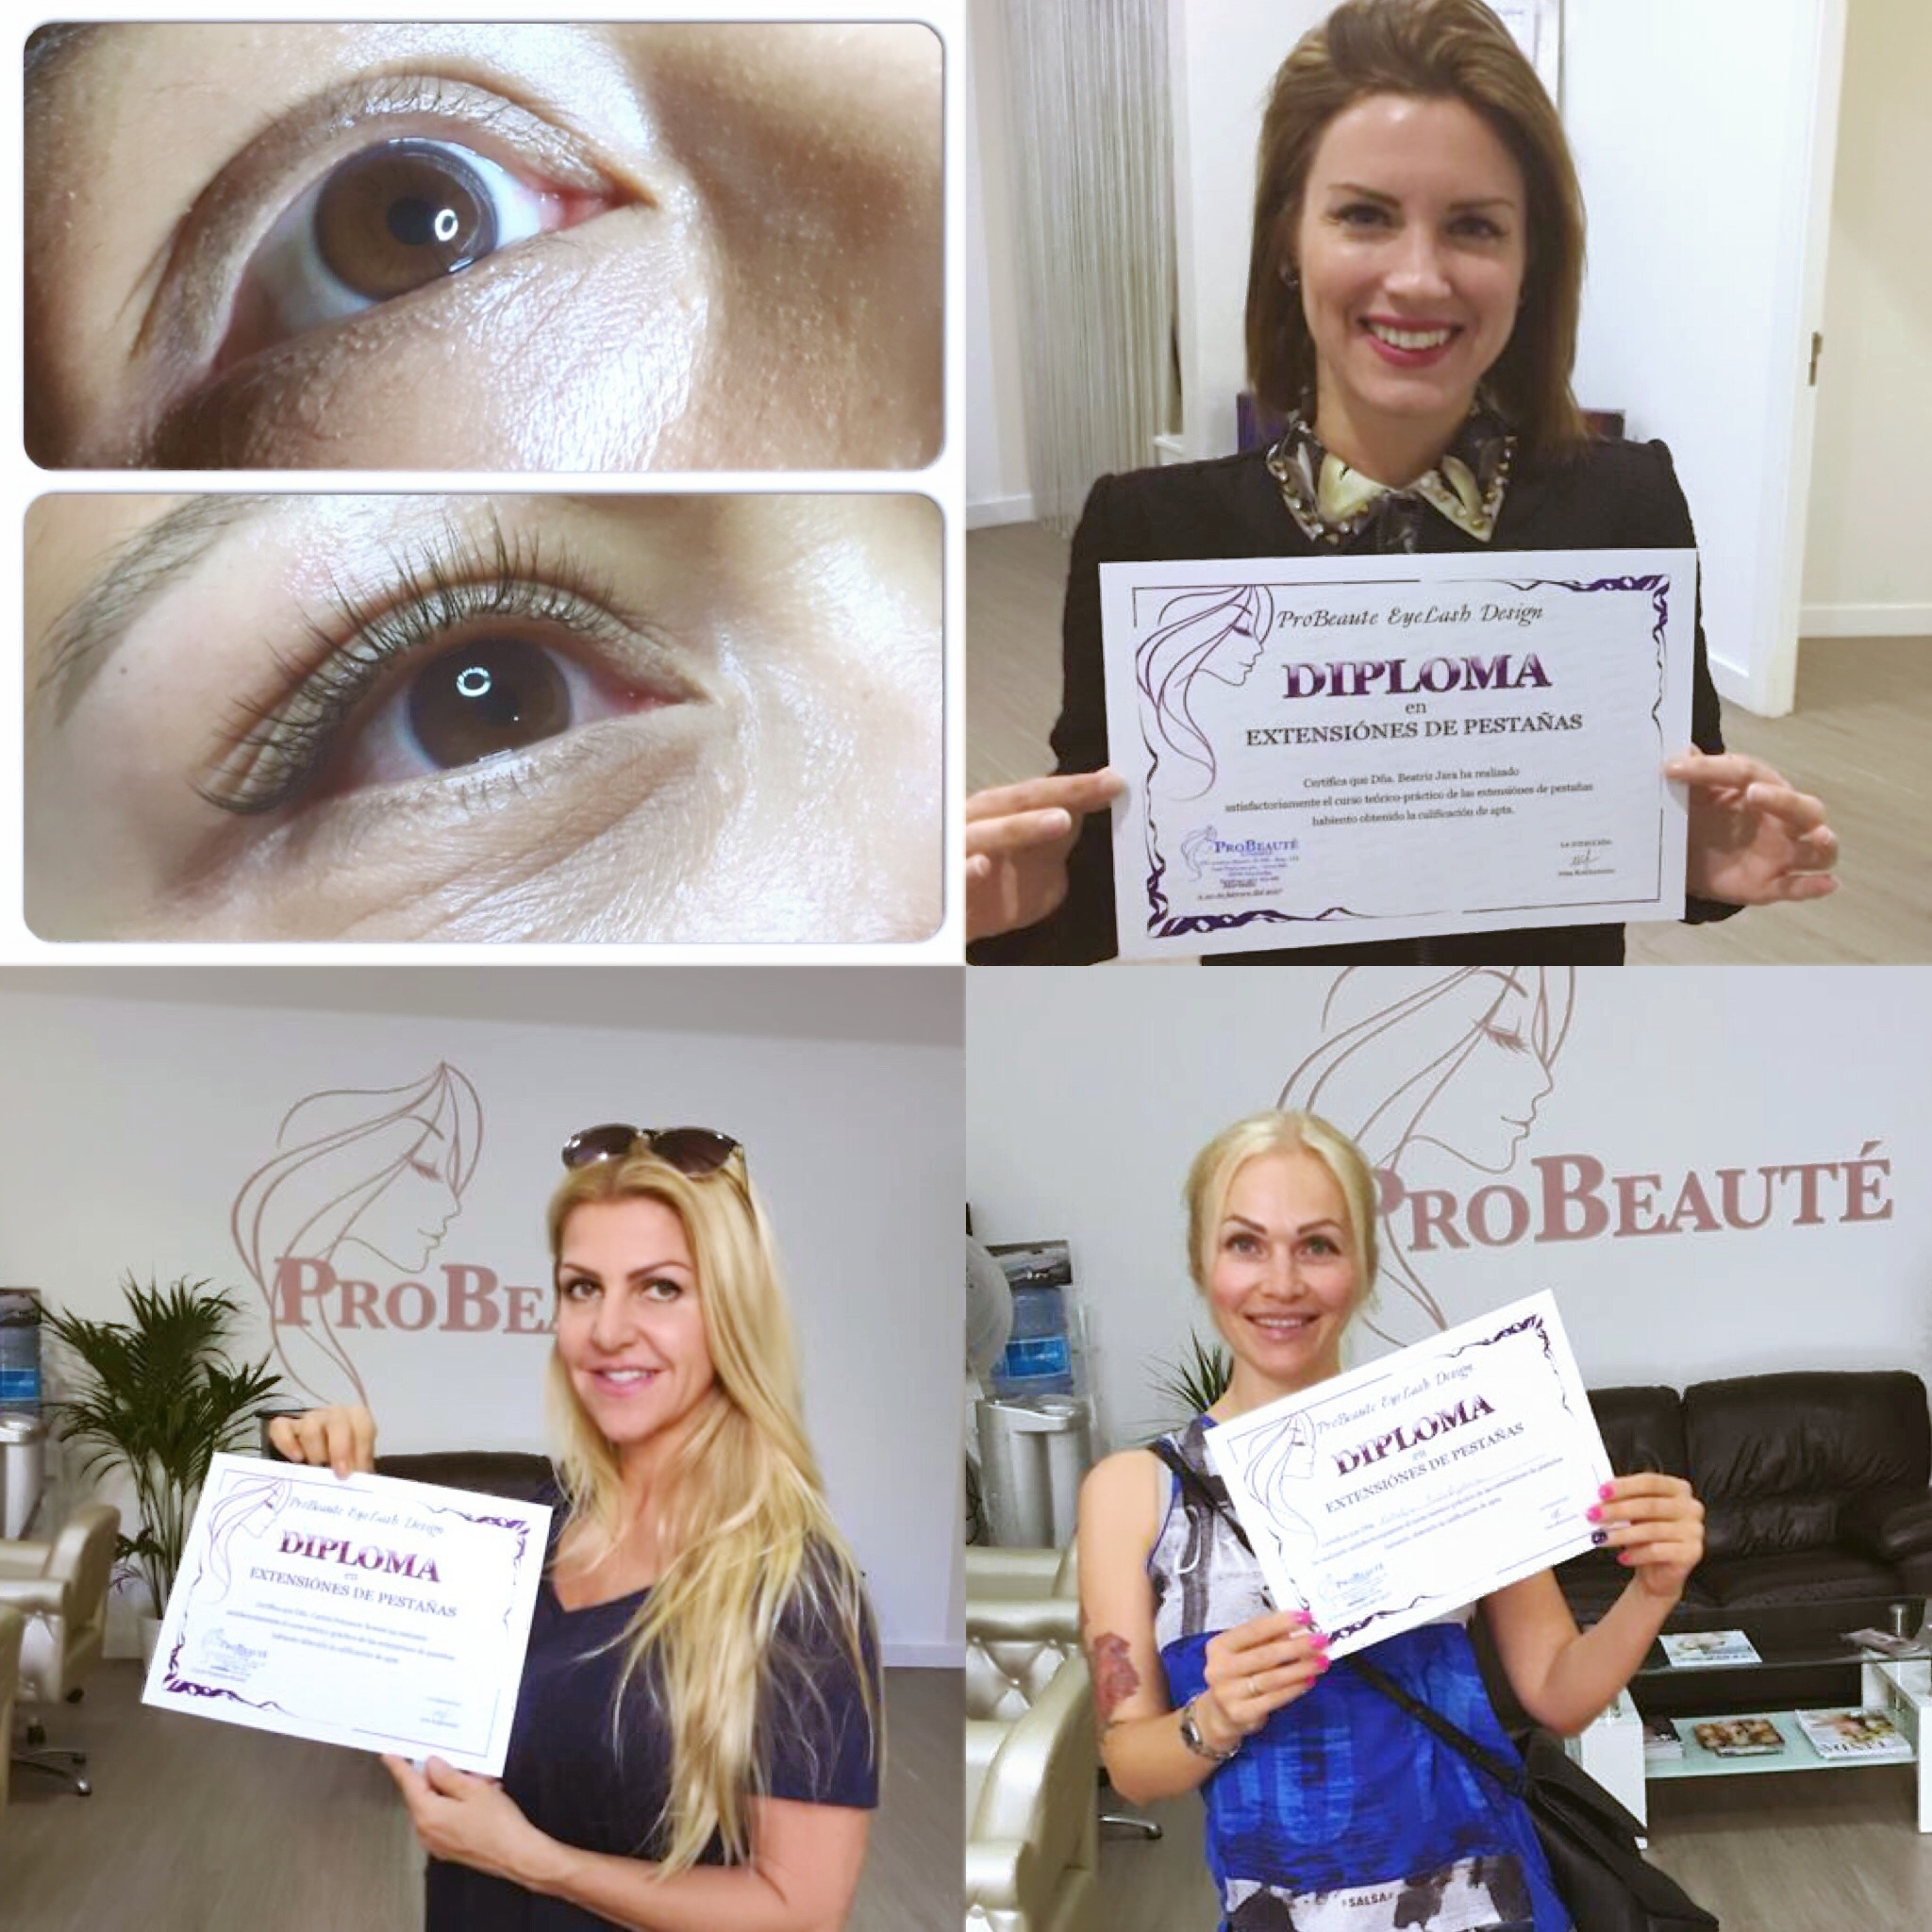 Eyelash Extensions Course Online Probeaute Marbella Beauty